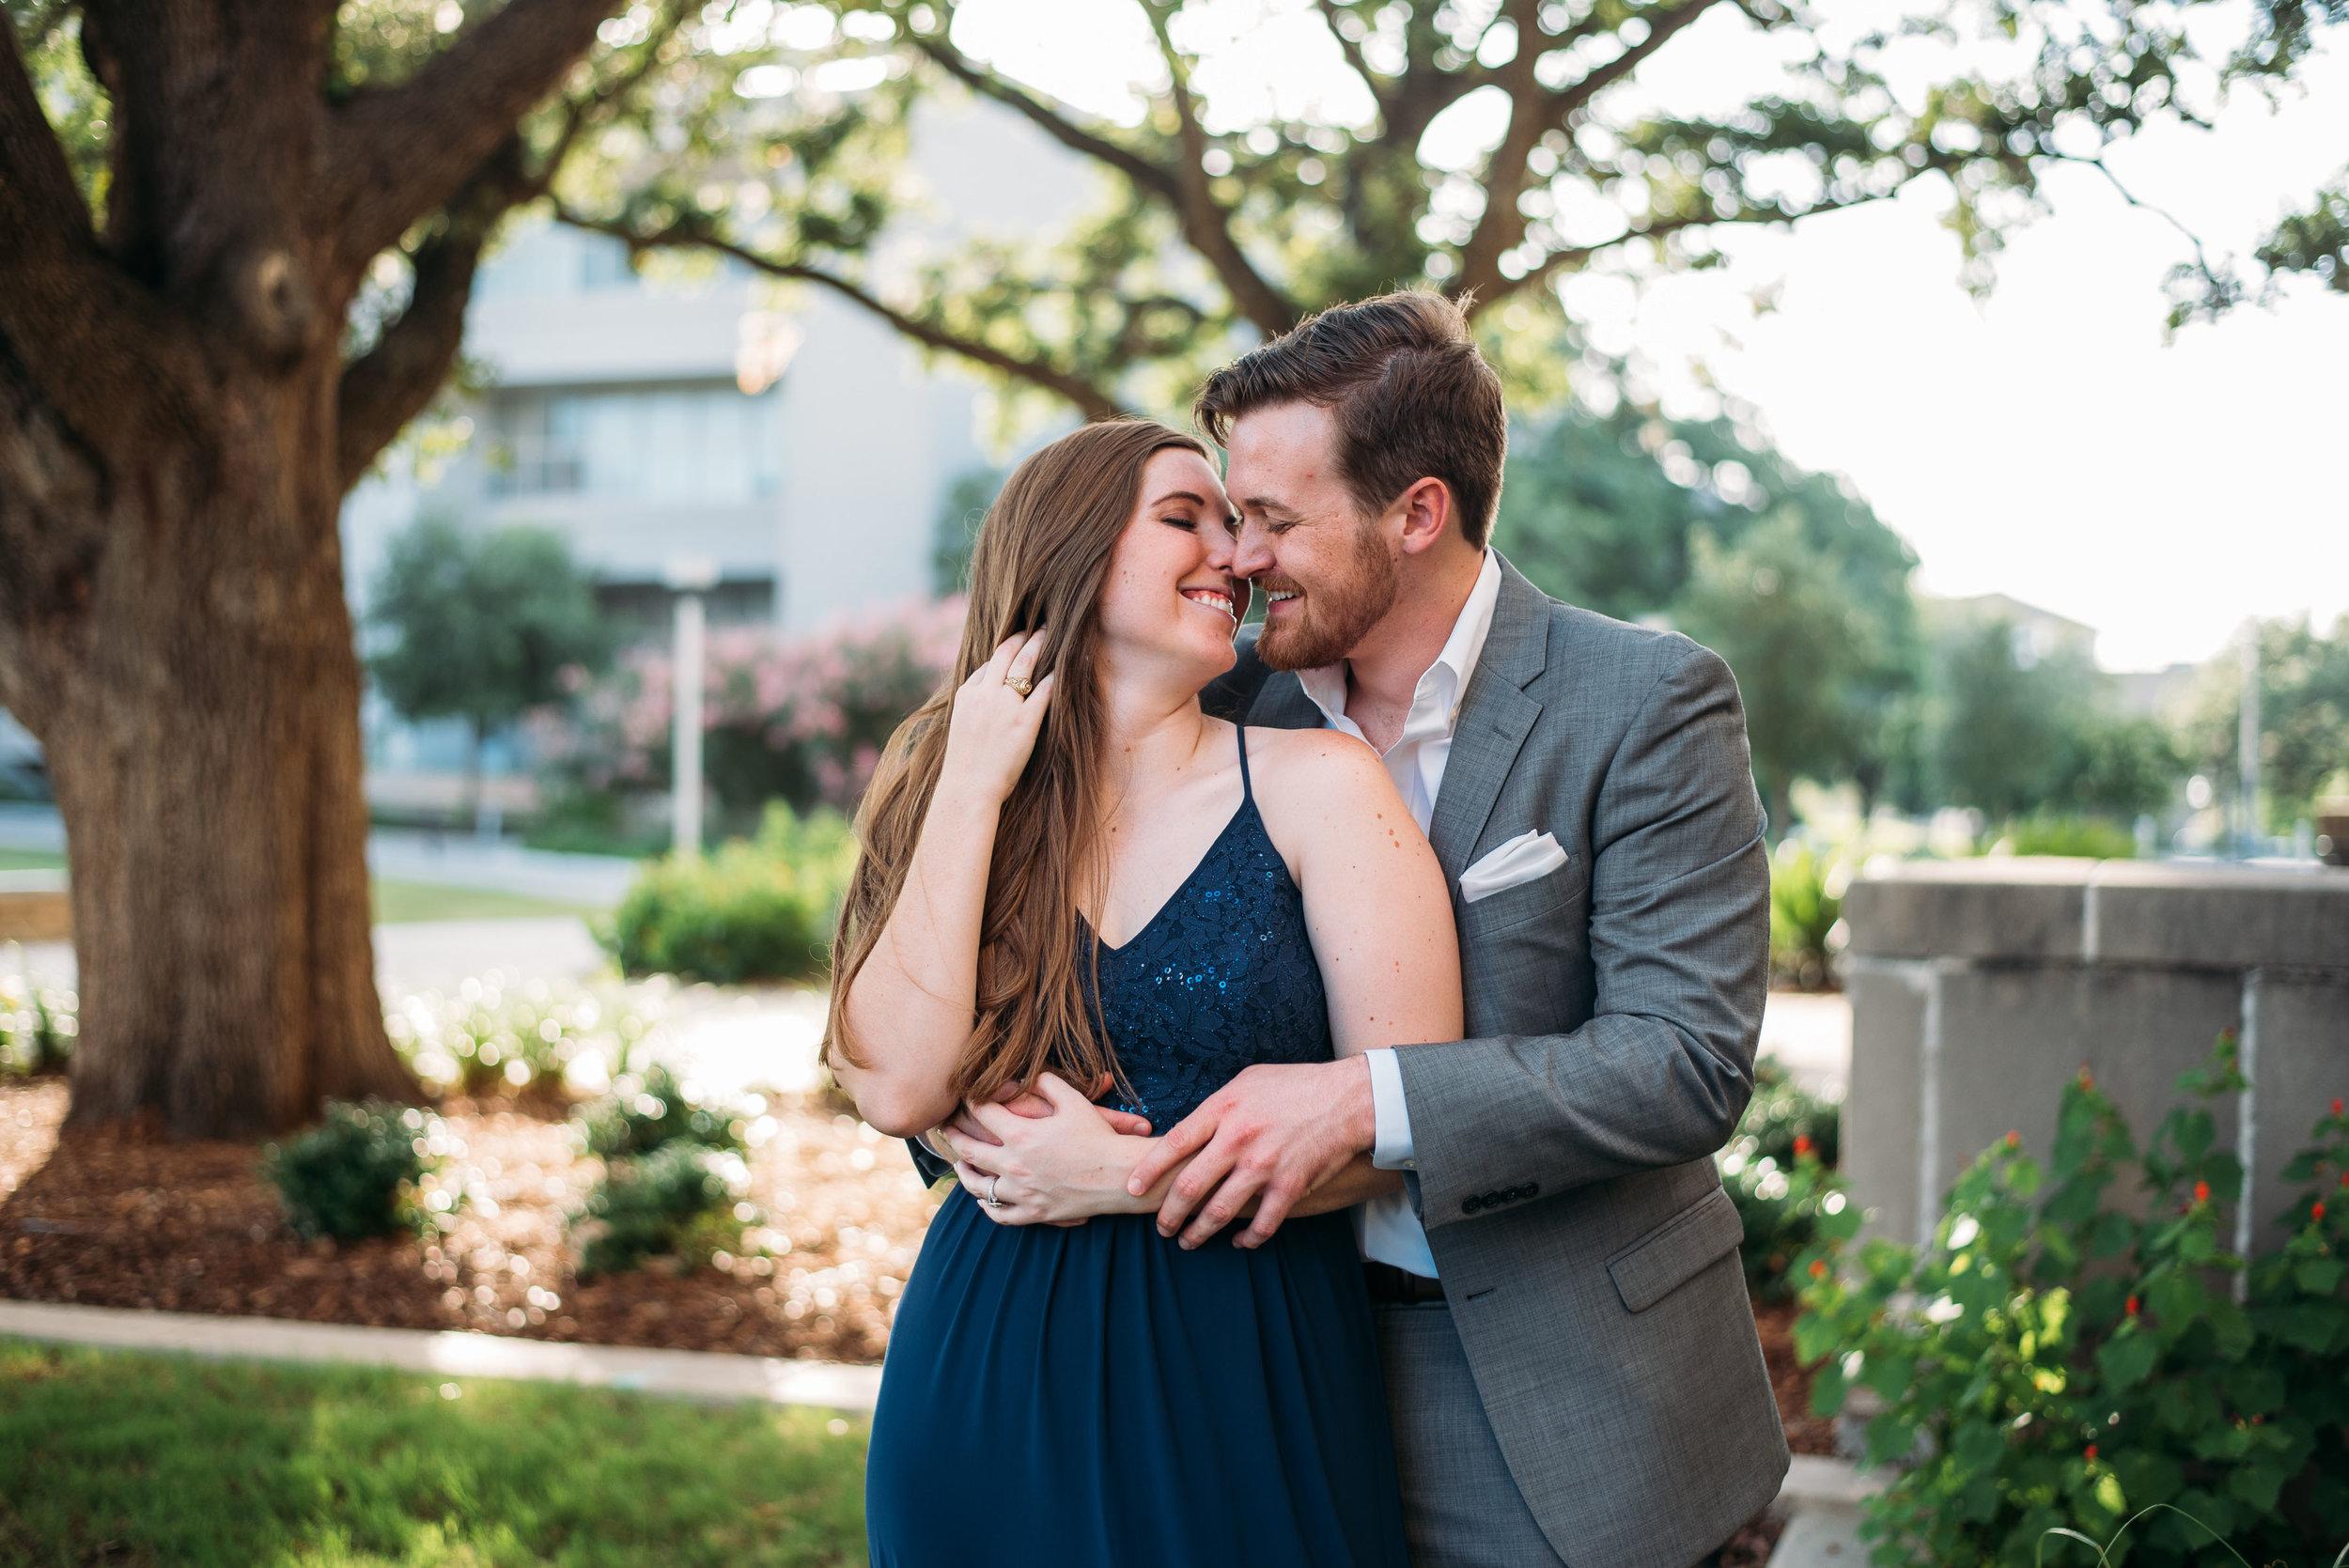 Texas-A&M-University-Engagement-College-Station-Wedding-Photographer-San-Angel-Photo-Mark-Johanna-Century-Tree-16.jpg